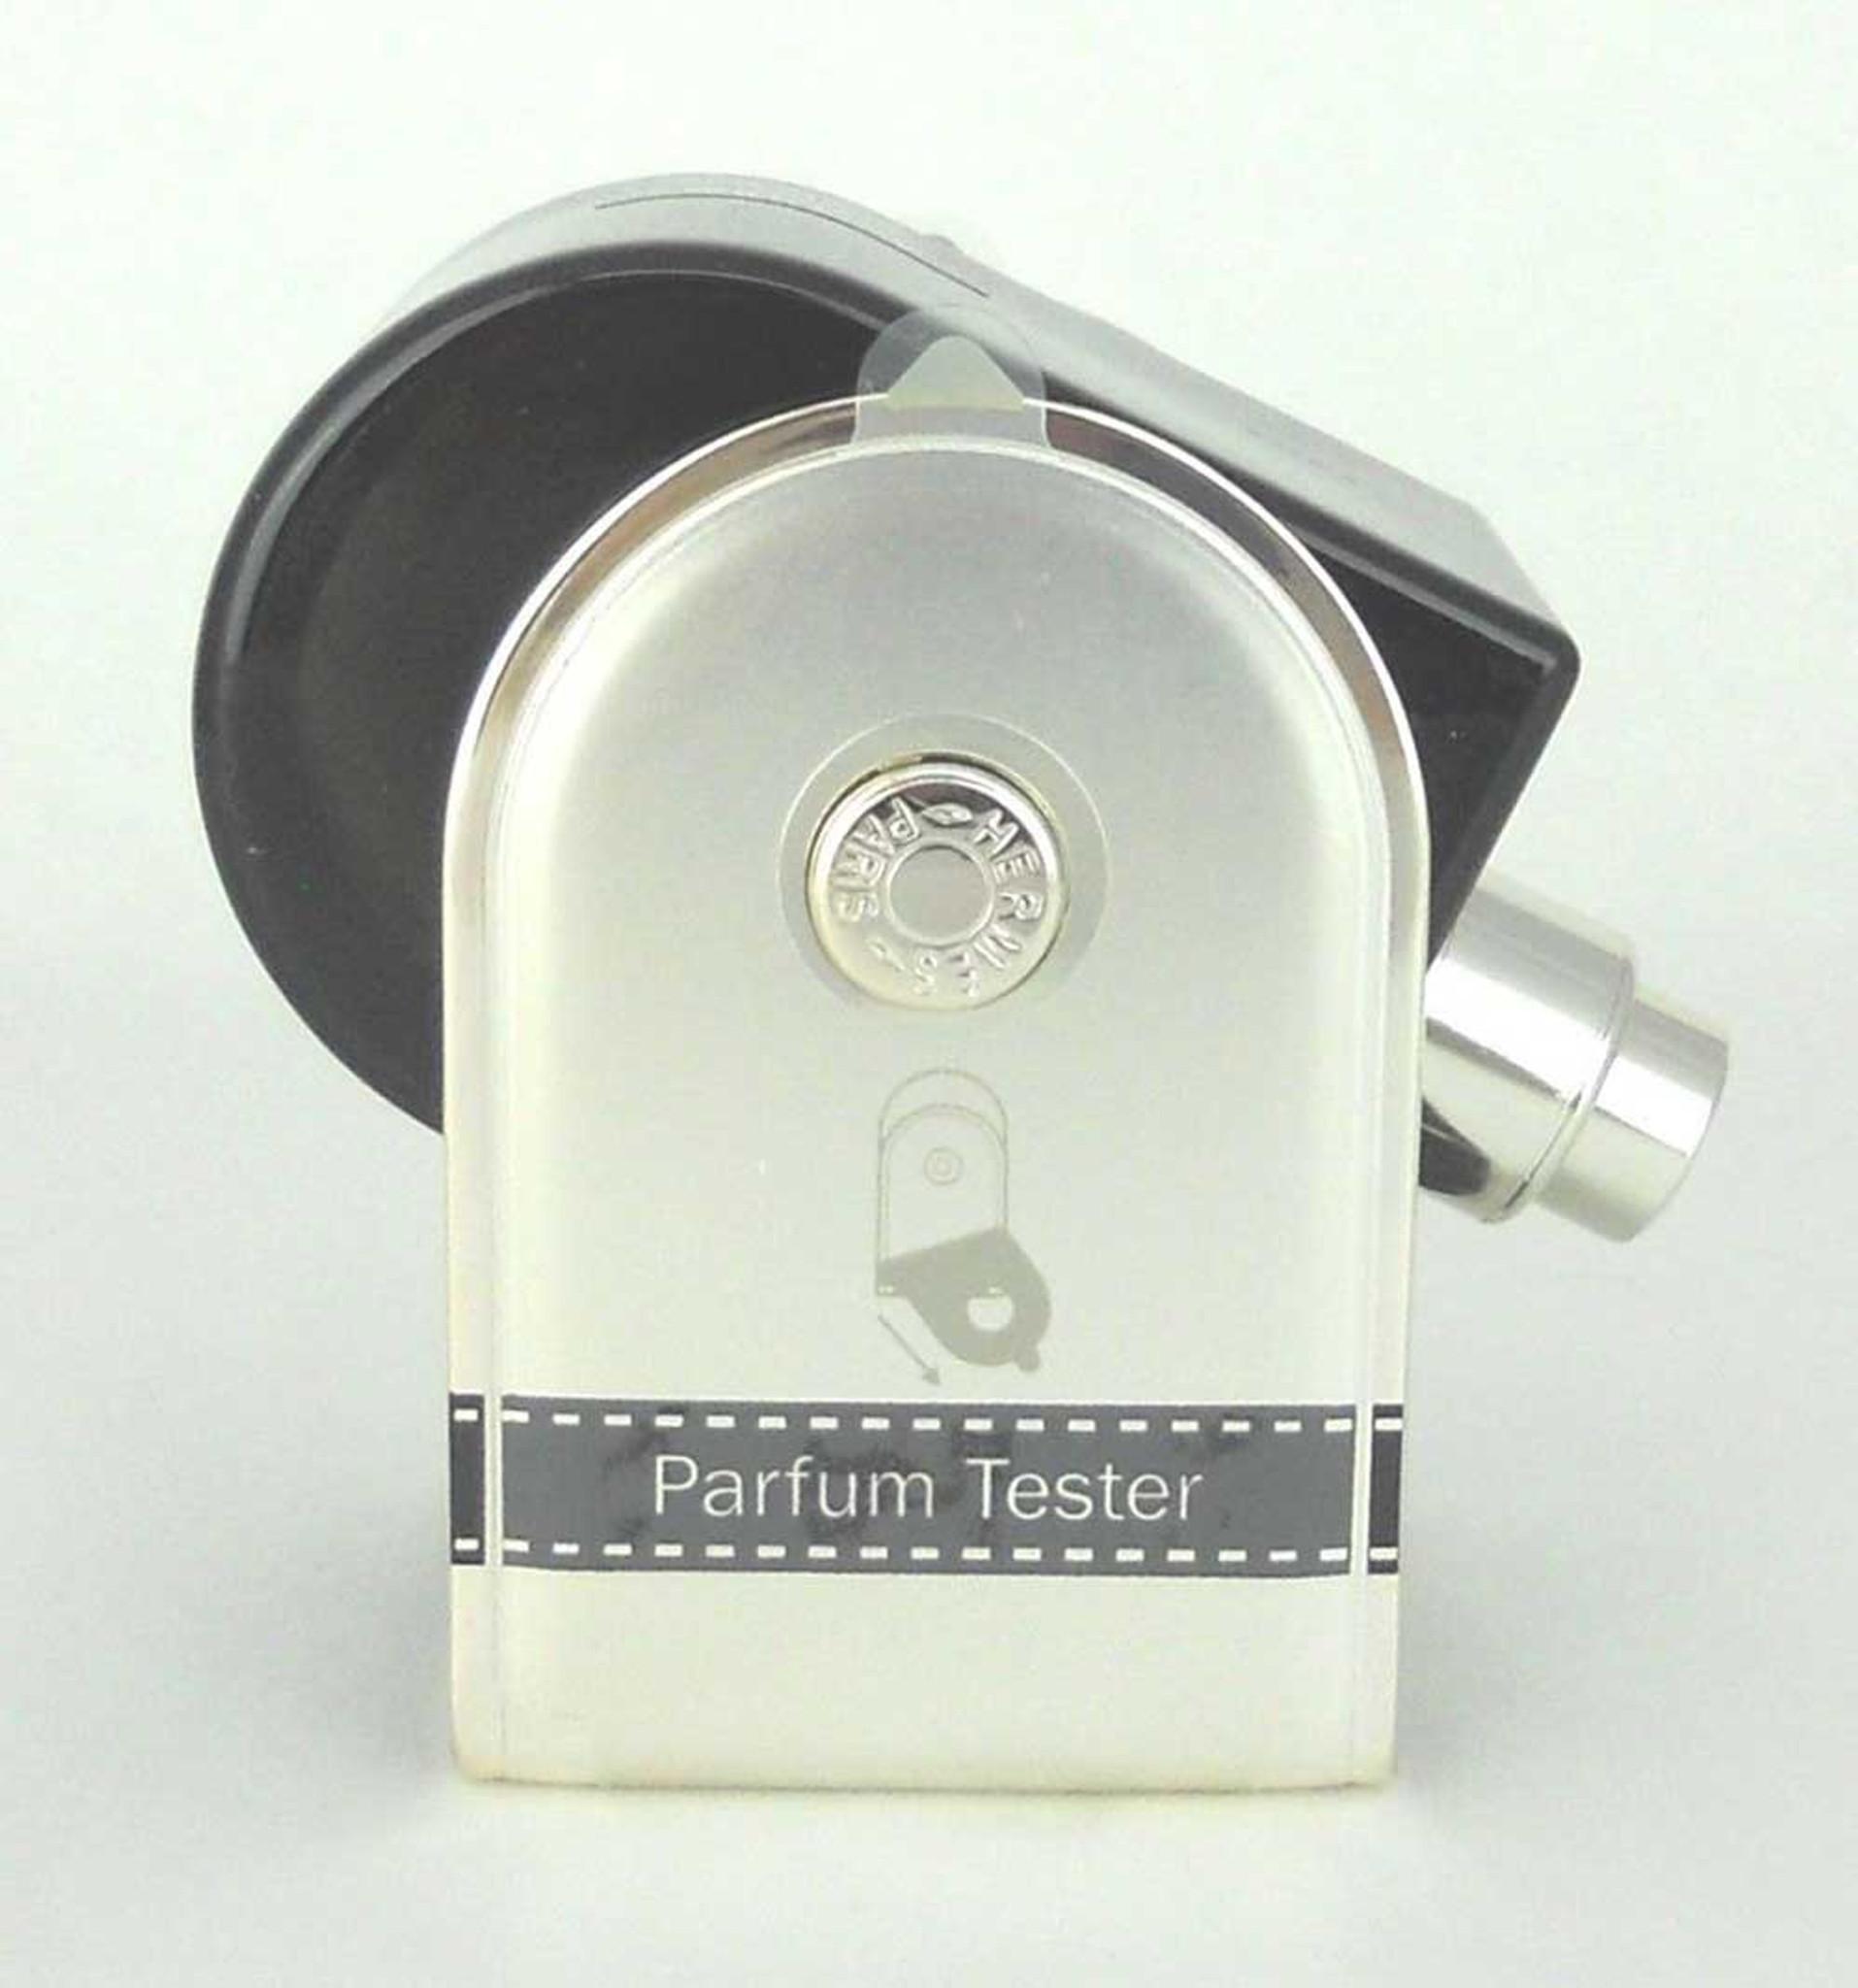 Hermes Mltester Parfum 3 100 By Spray D'hermes 3 Voyage Oz F13lKTJuc